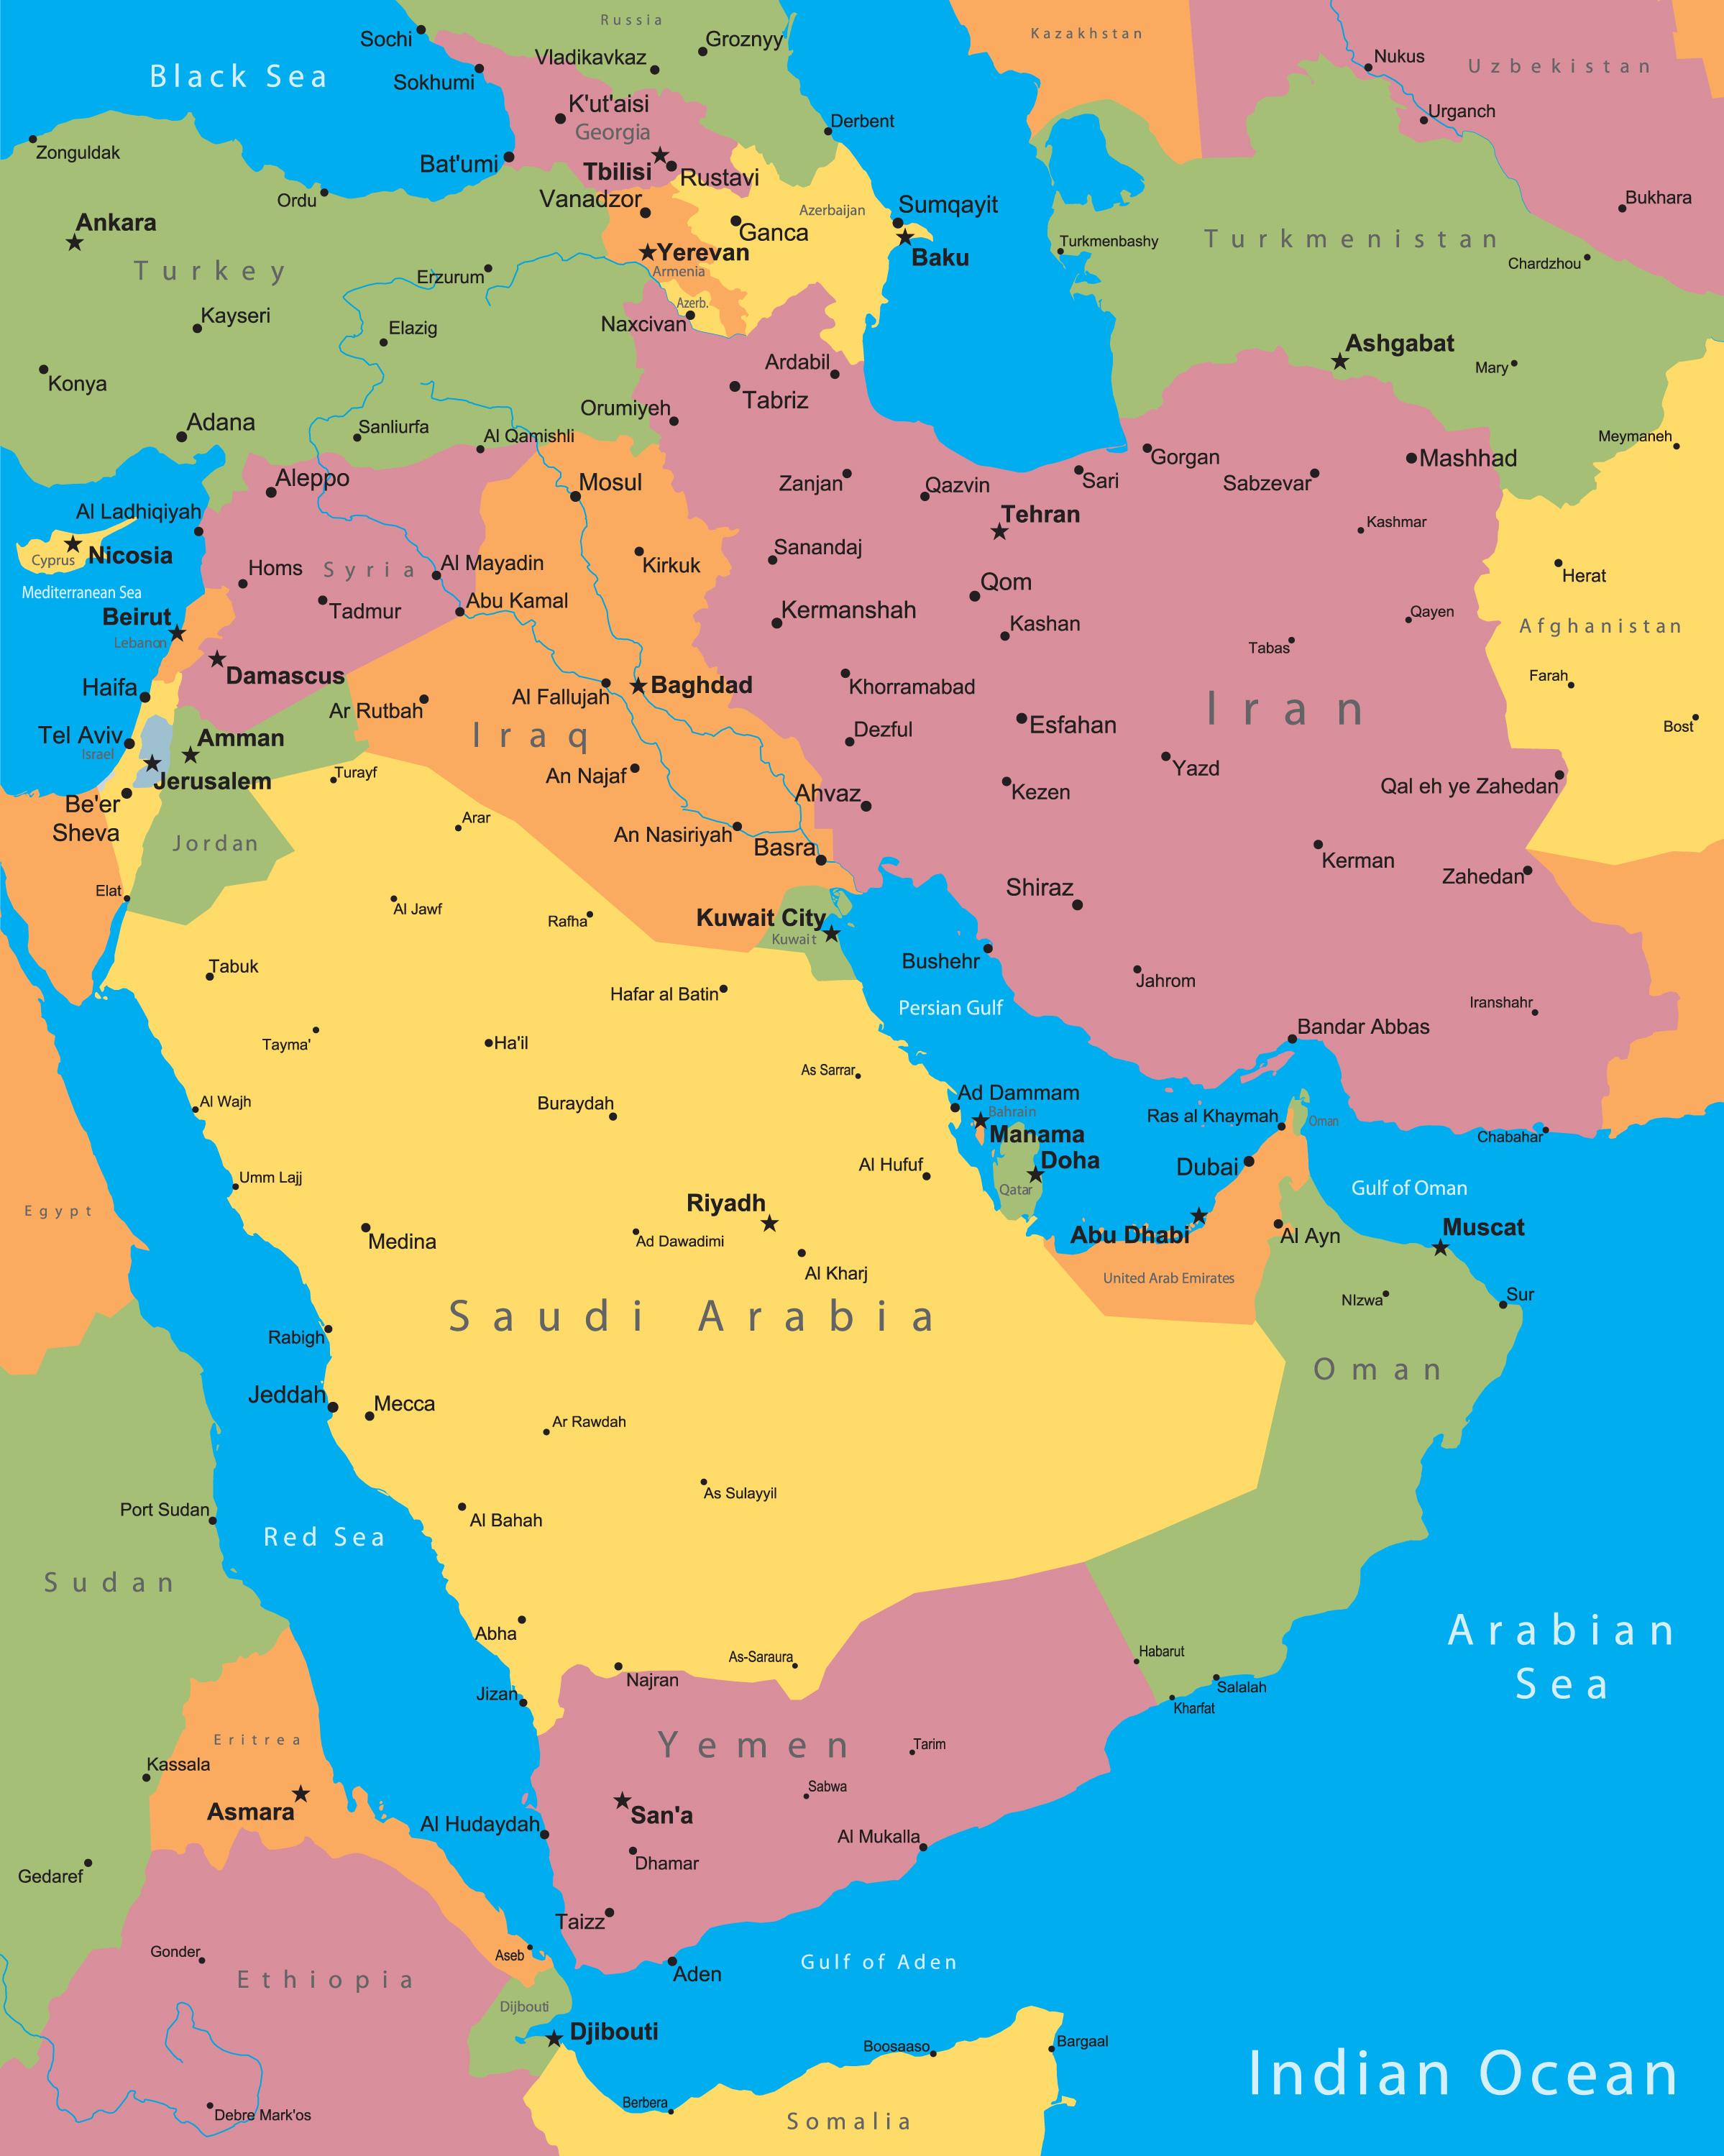 The United Arab Emirates Sovereign Wealth Fund totals 815 billion